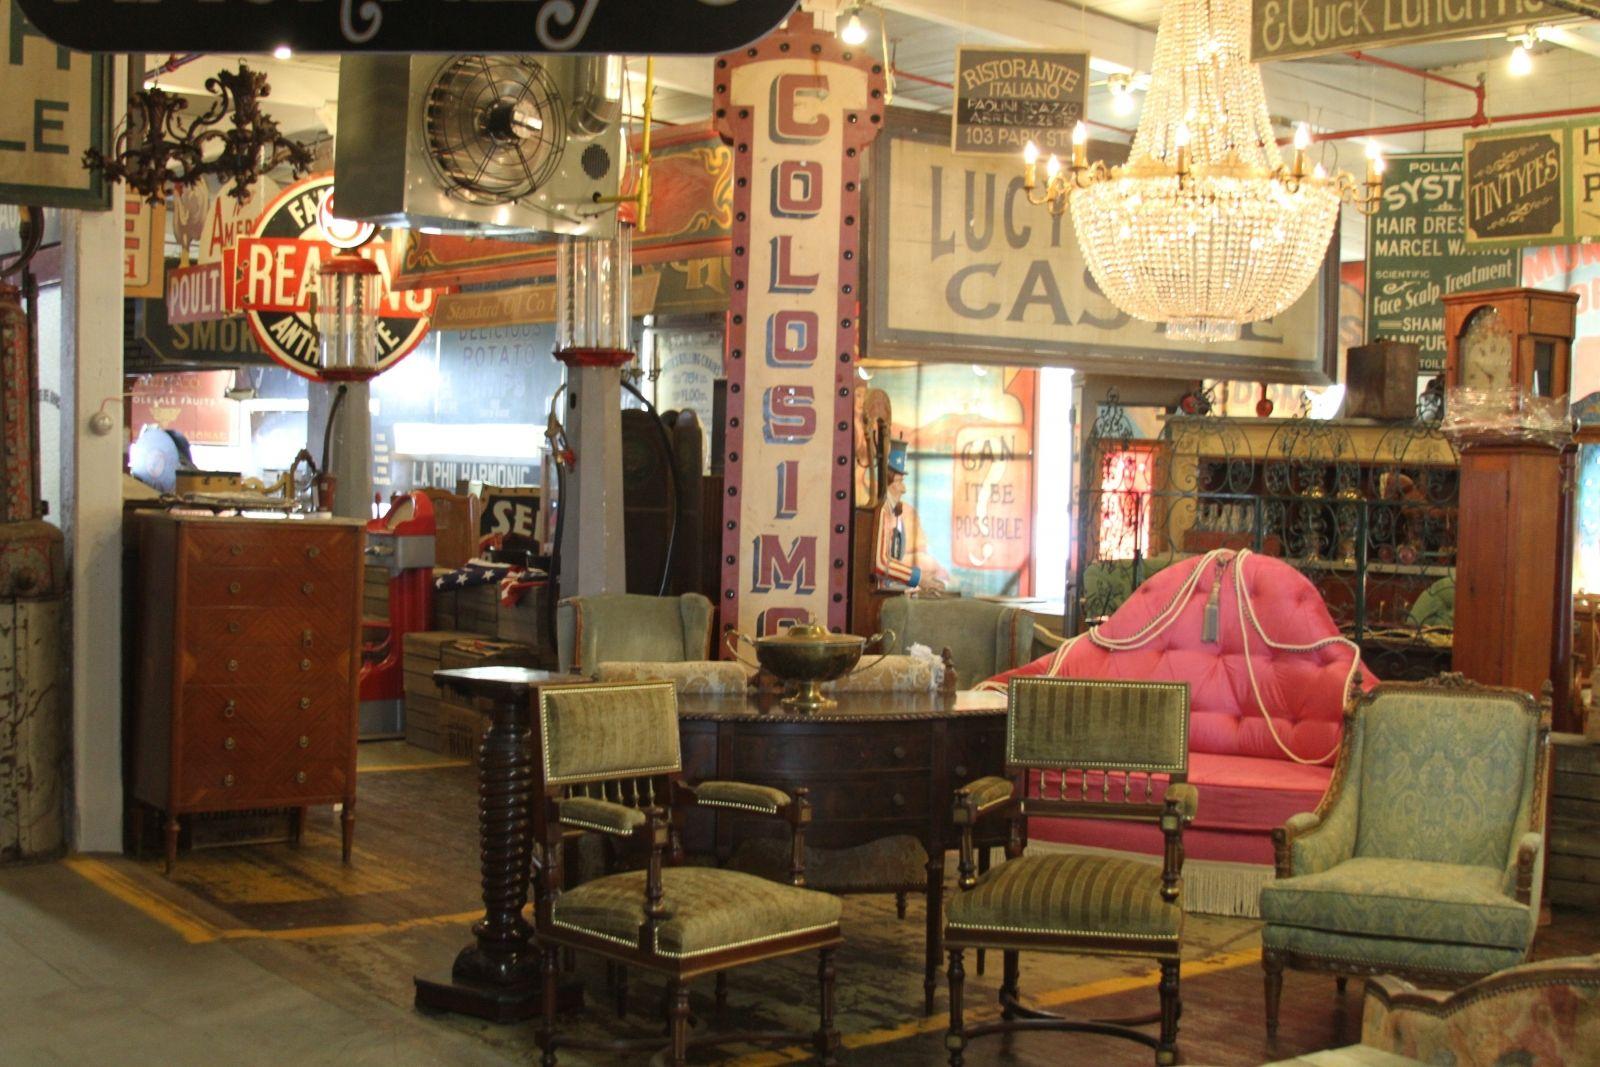 Vintage carnival ride www imgarcade com online image arcade - Boardwalk Empire Behind The Scenes Sets Gallery Art Deco Style Pinterest Boardwalk Empire